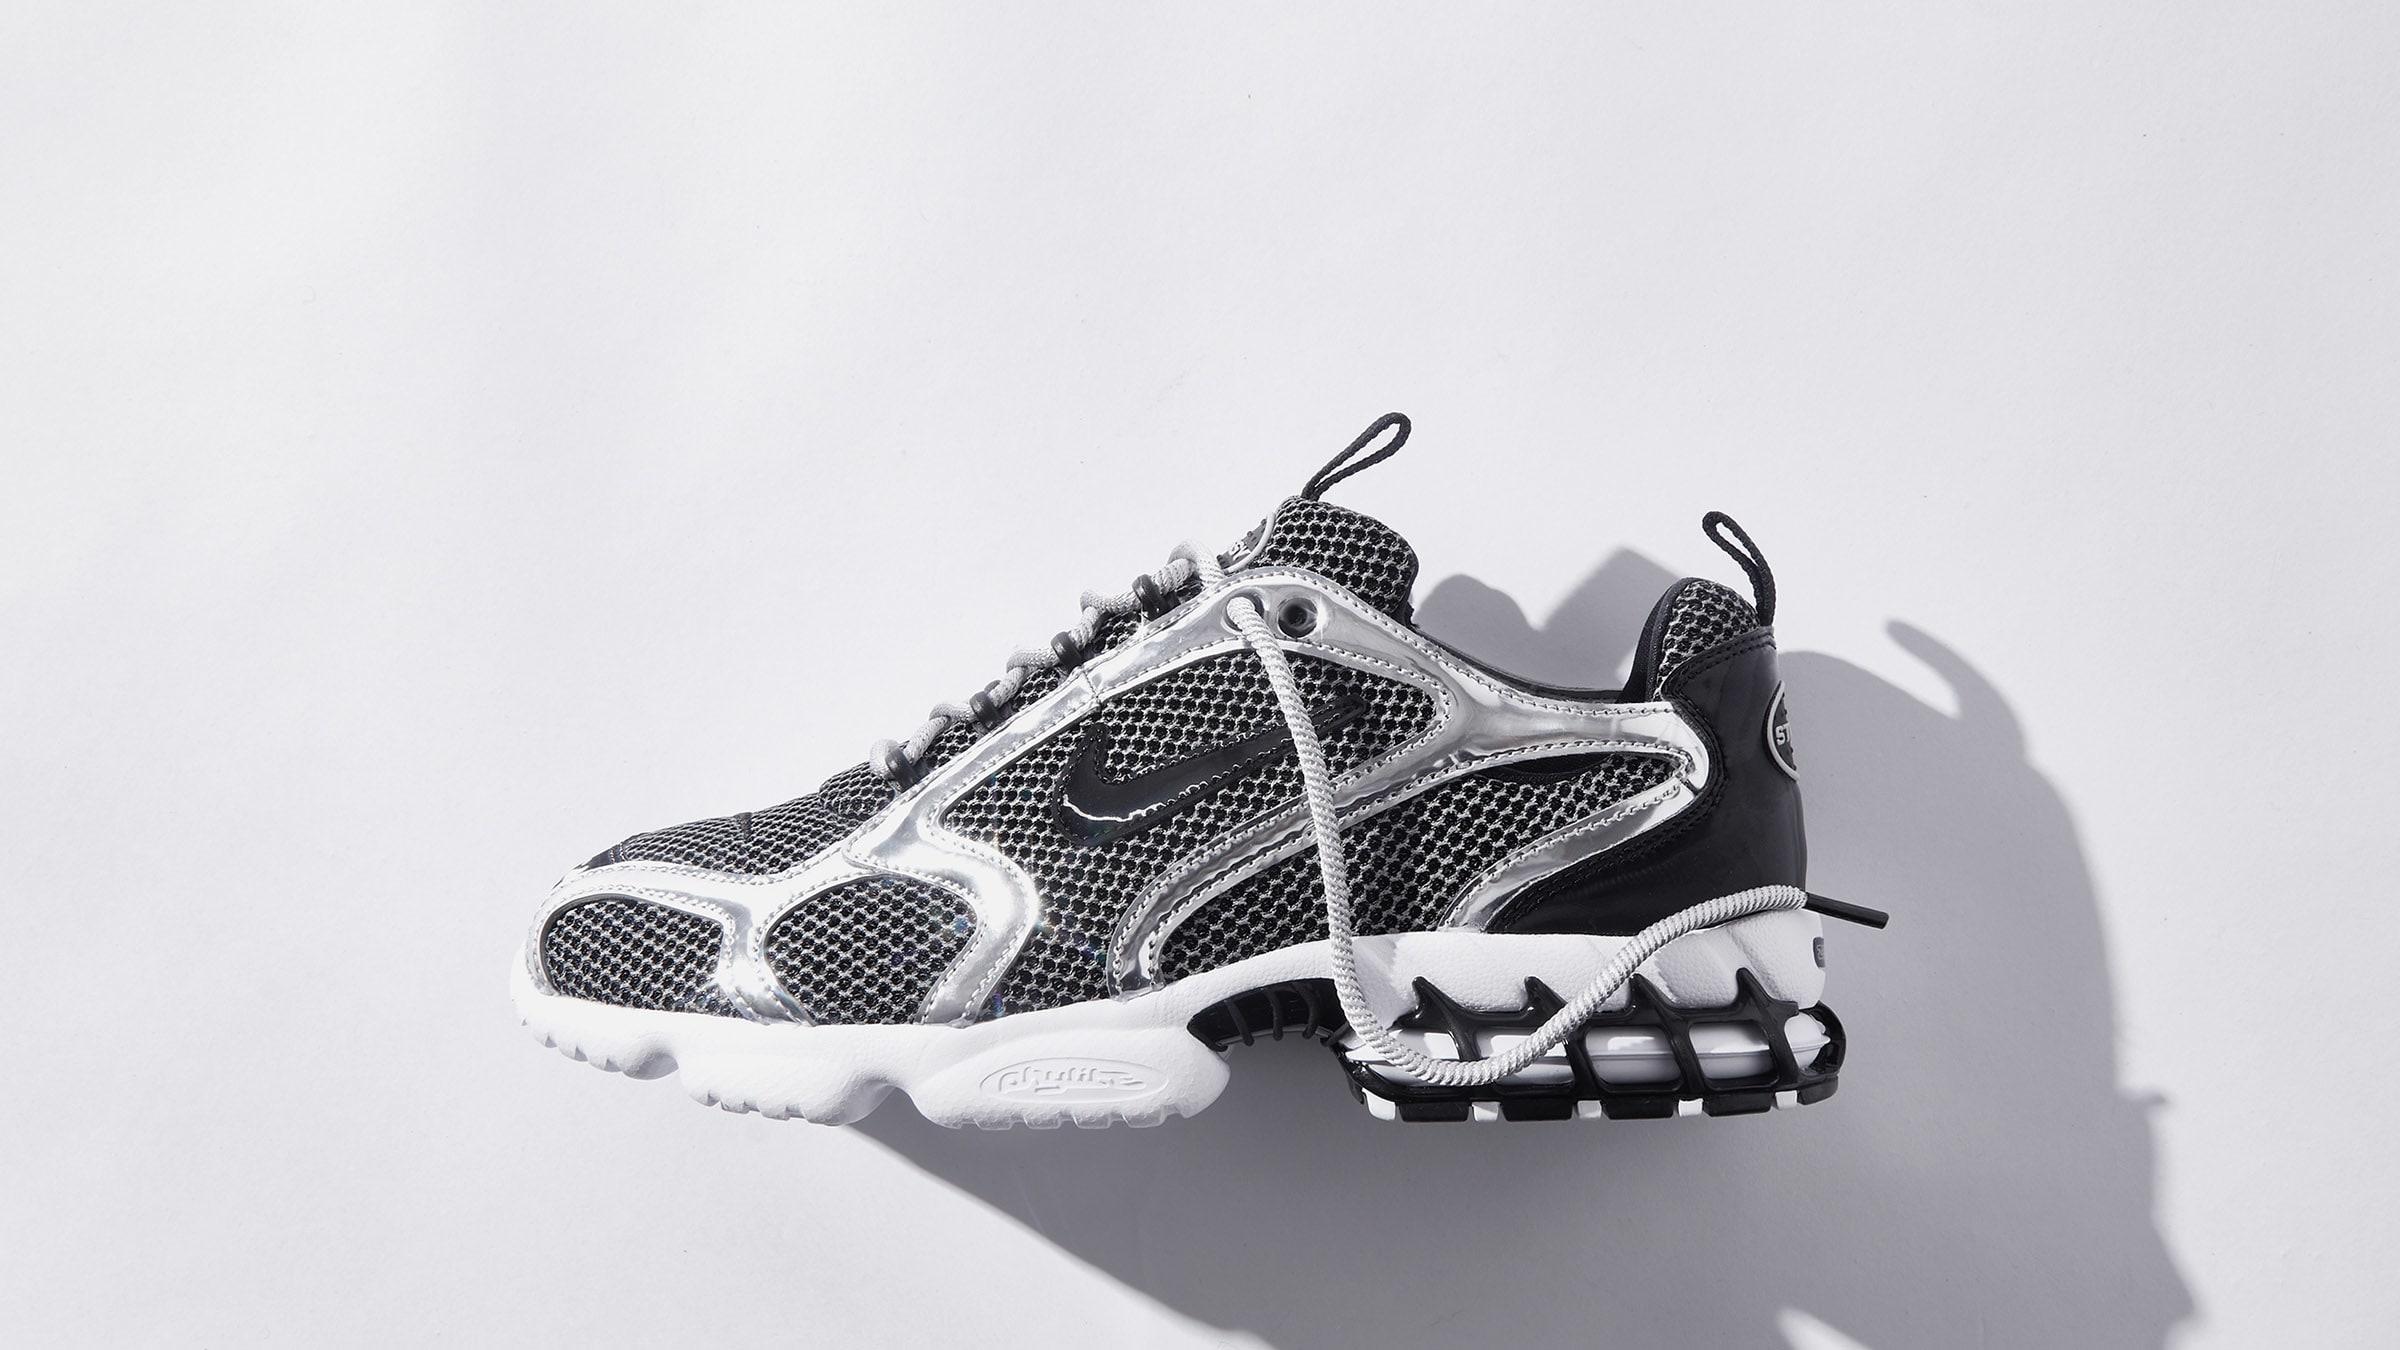 Nike x Stussy Air Zoom Spiridon Cage 2 - CU1854-001